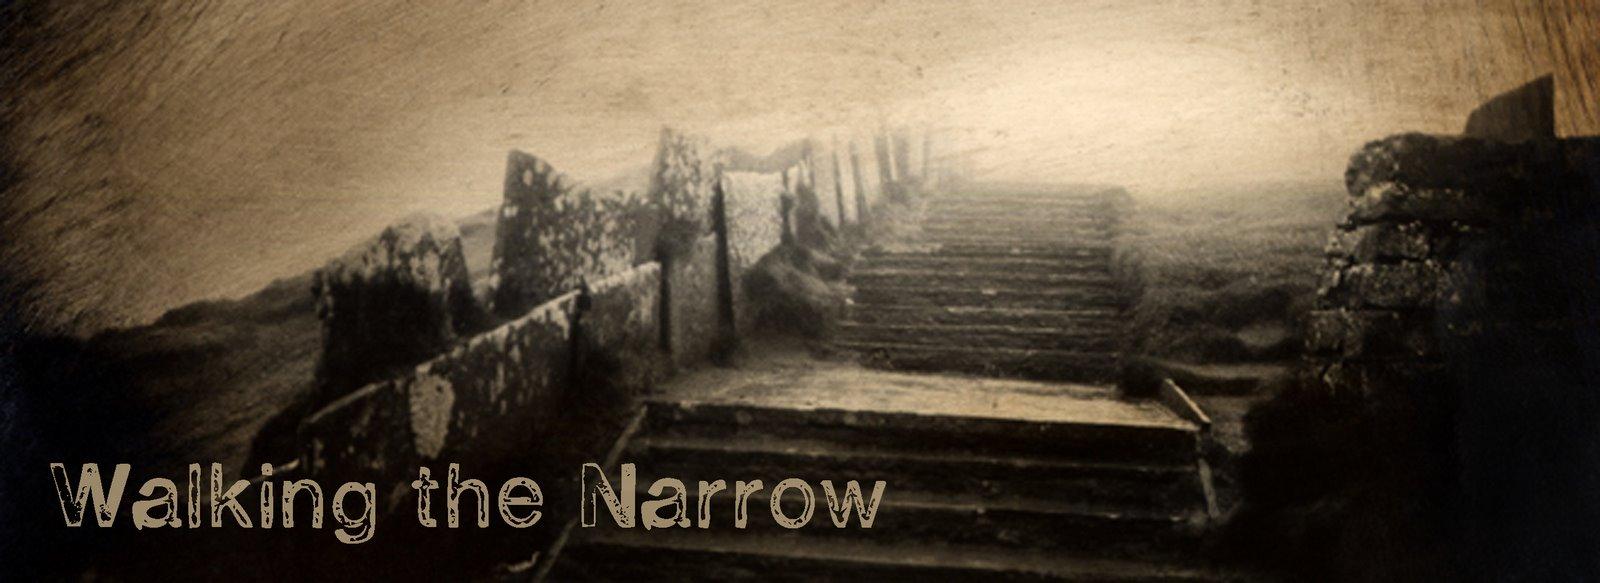 Walking The Narrow